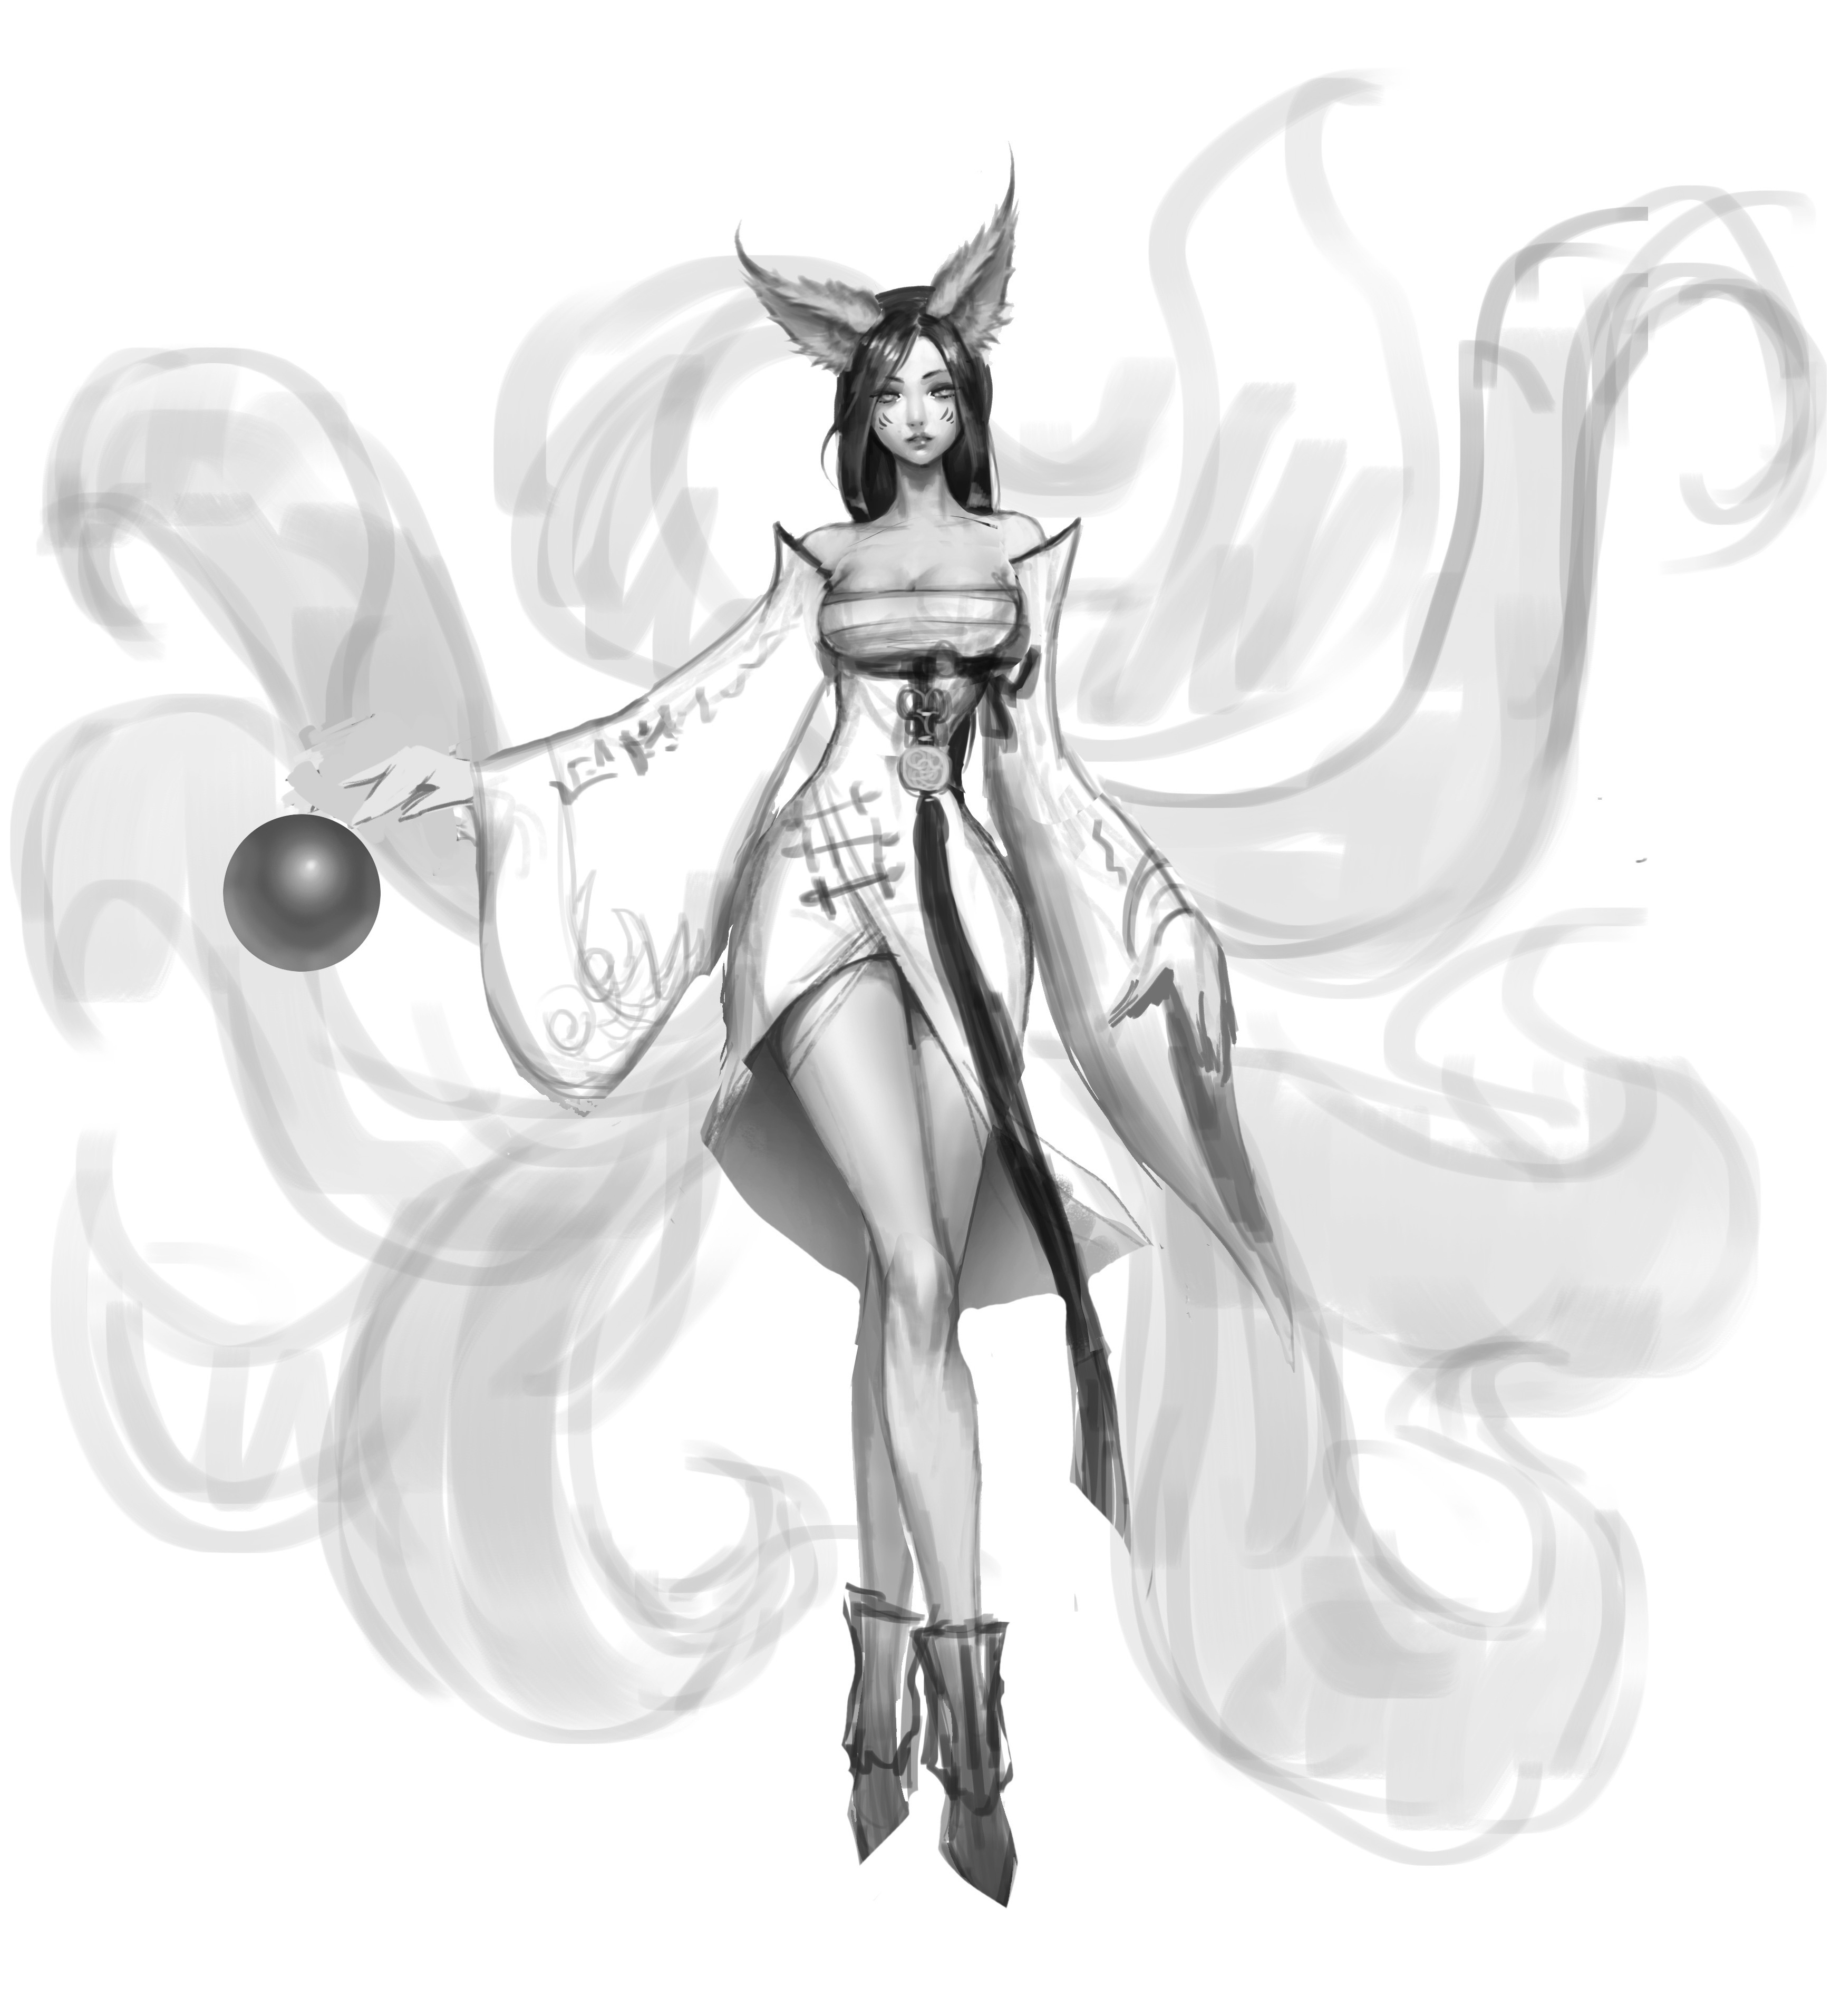 Ahri's Original Concept Art